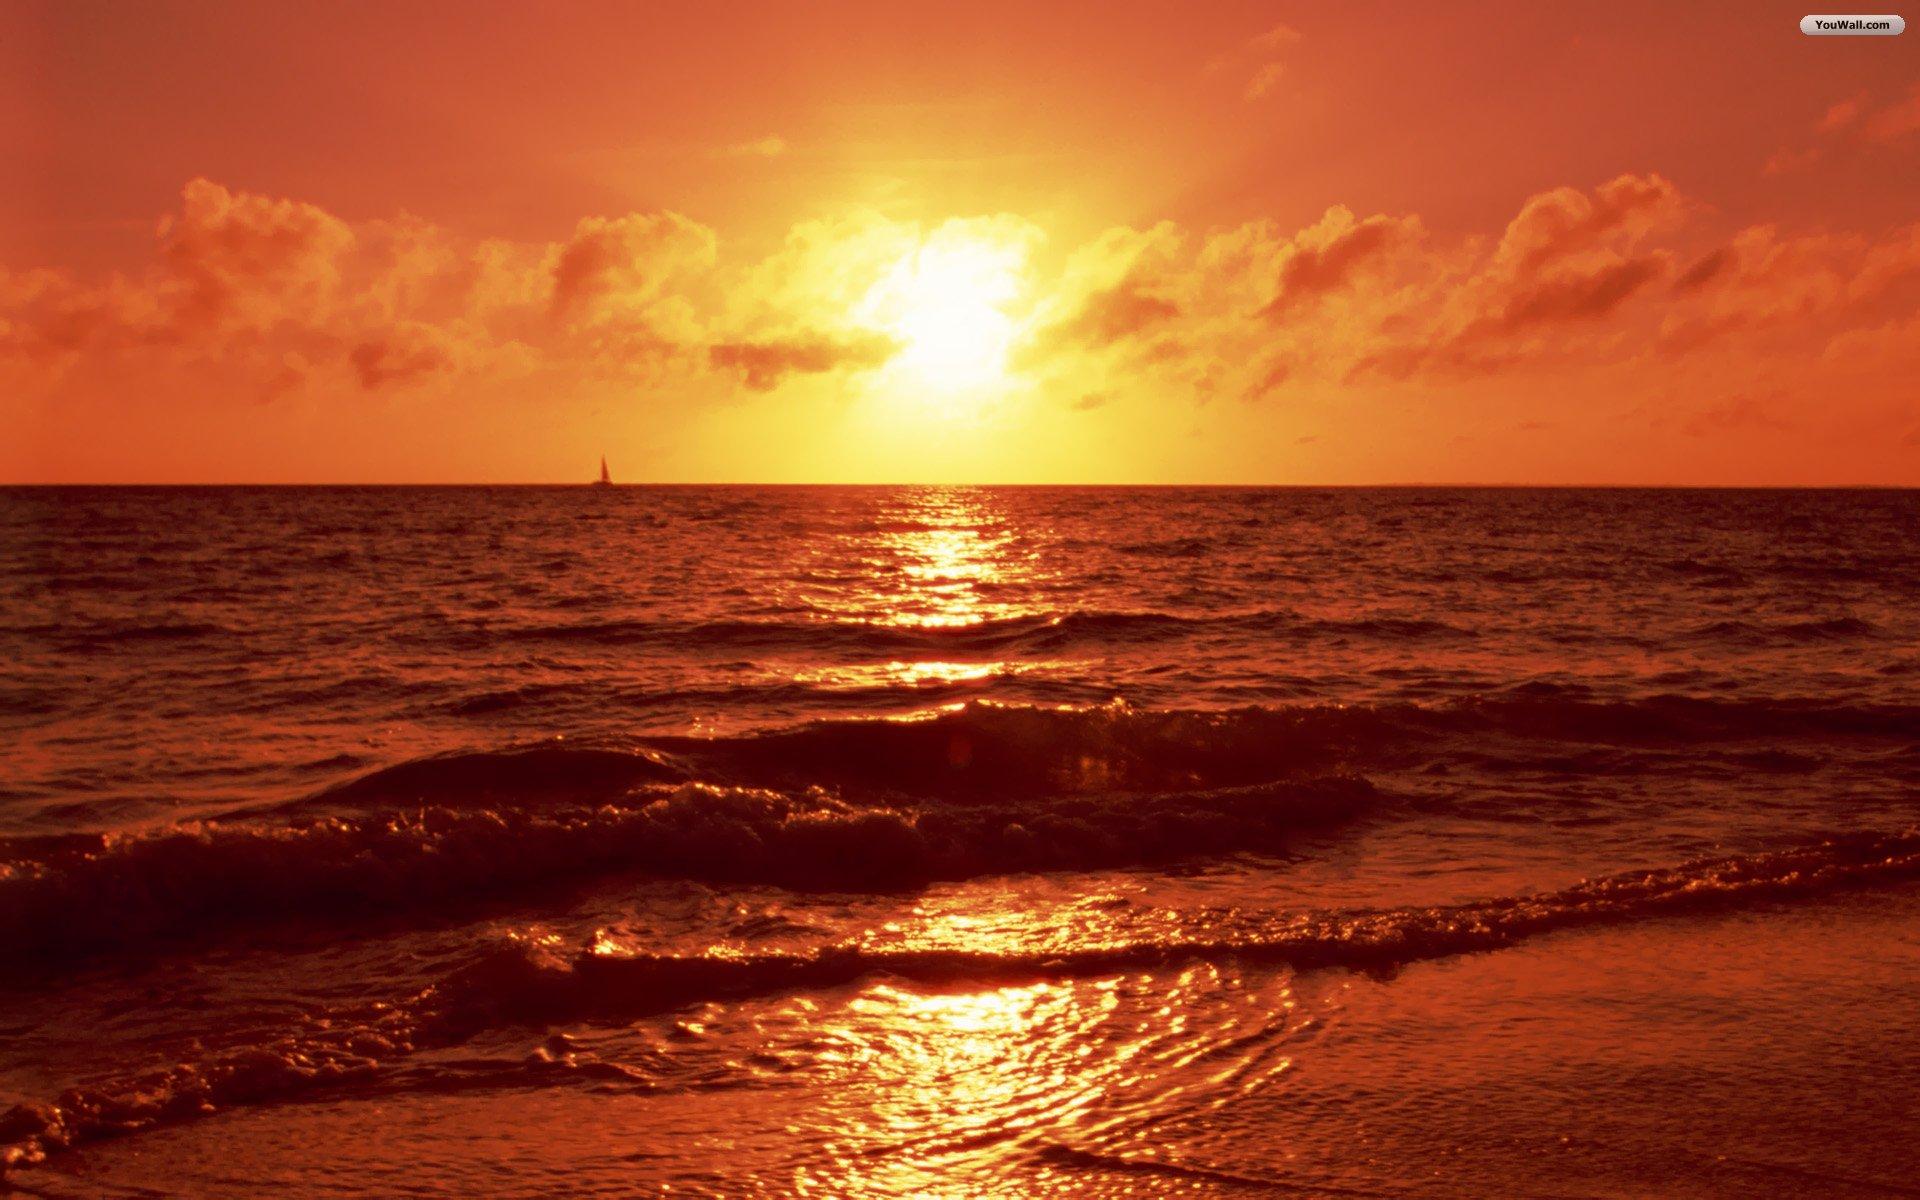 Beach Sunset Wallpaper Image Picture 2339 Wallpaper 1920x1200